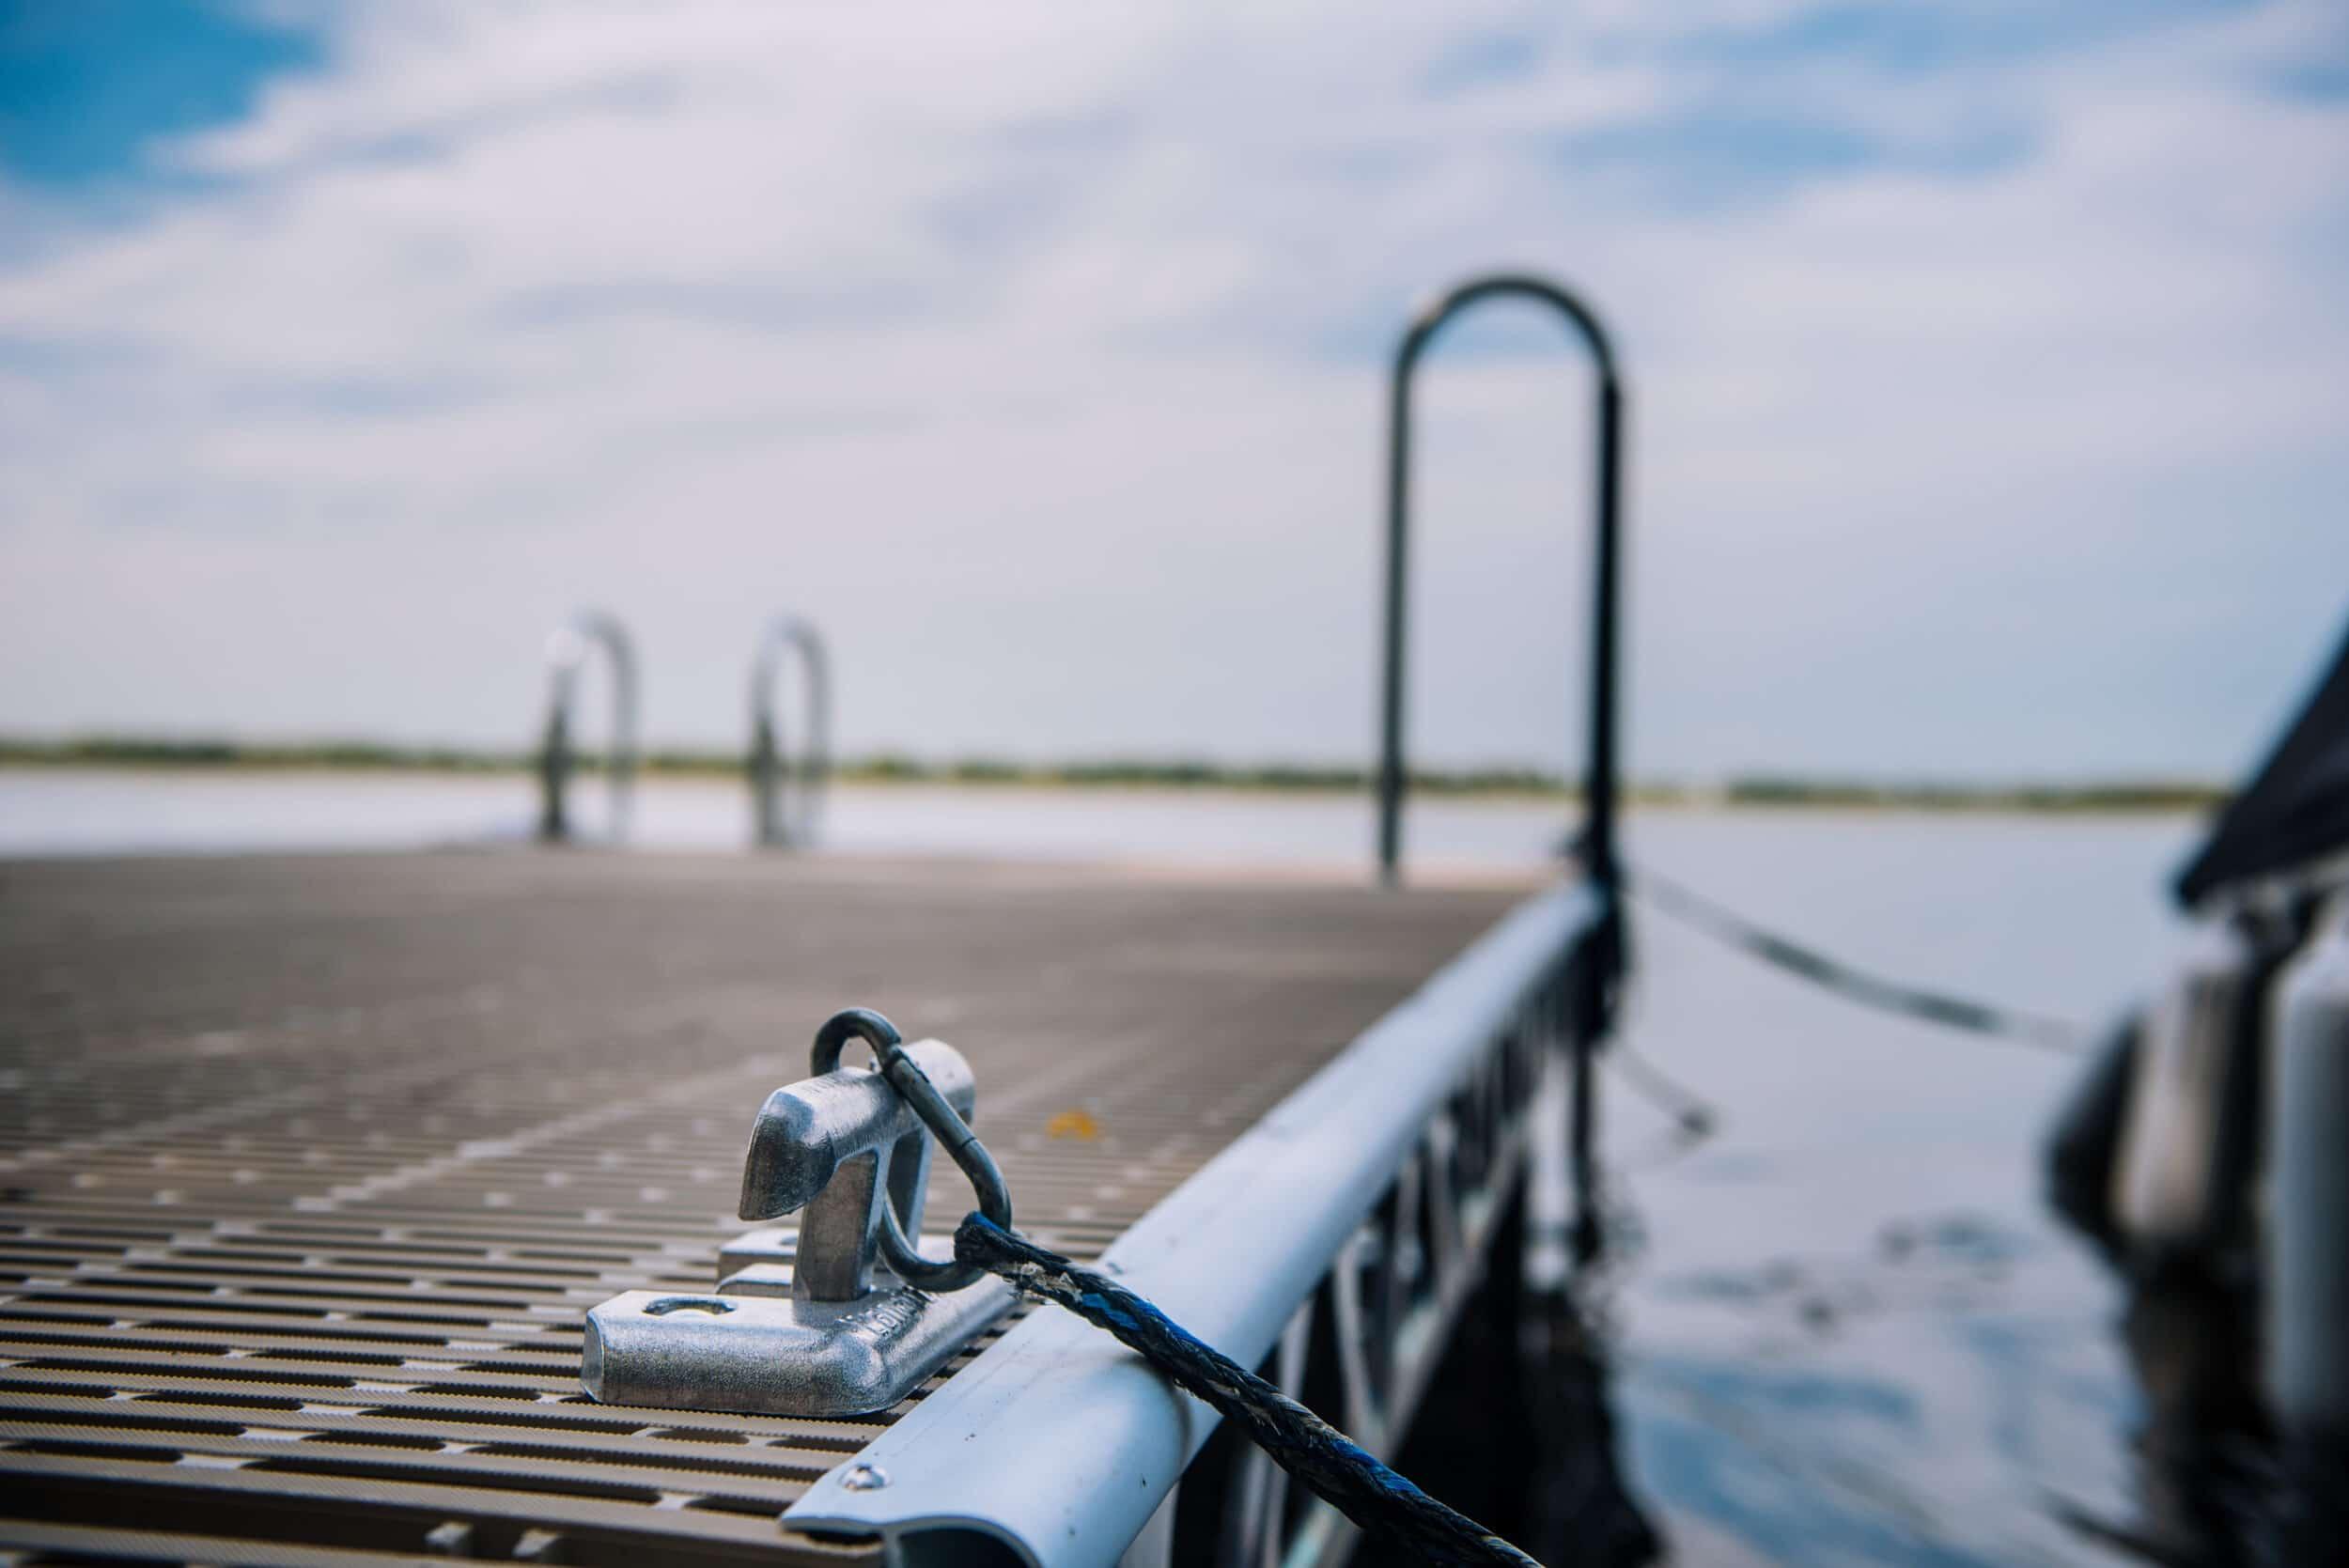 Dalyrmple Dock CanadaDocks Install